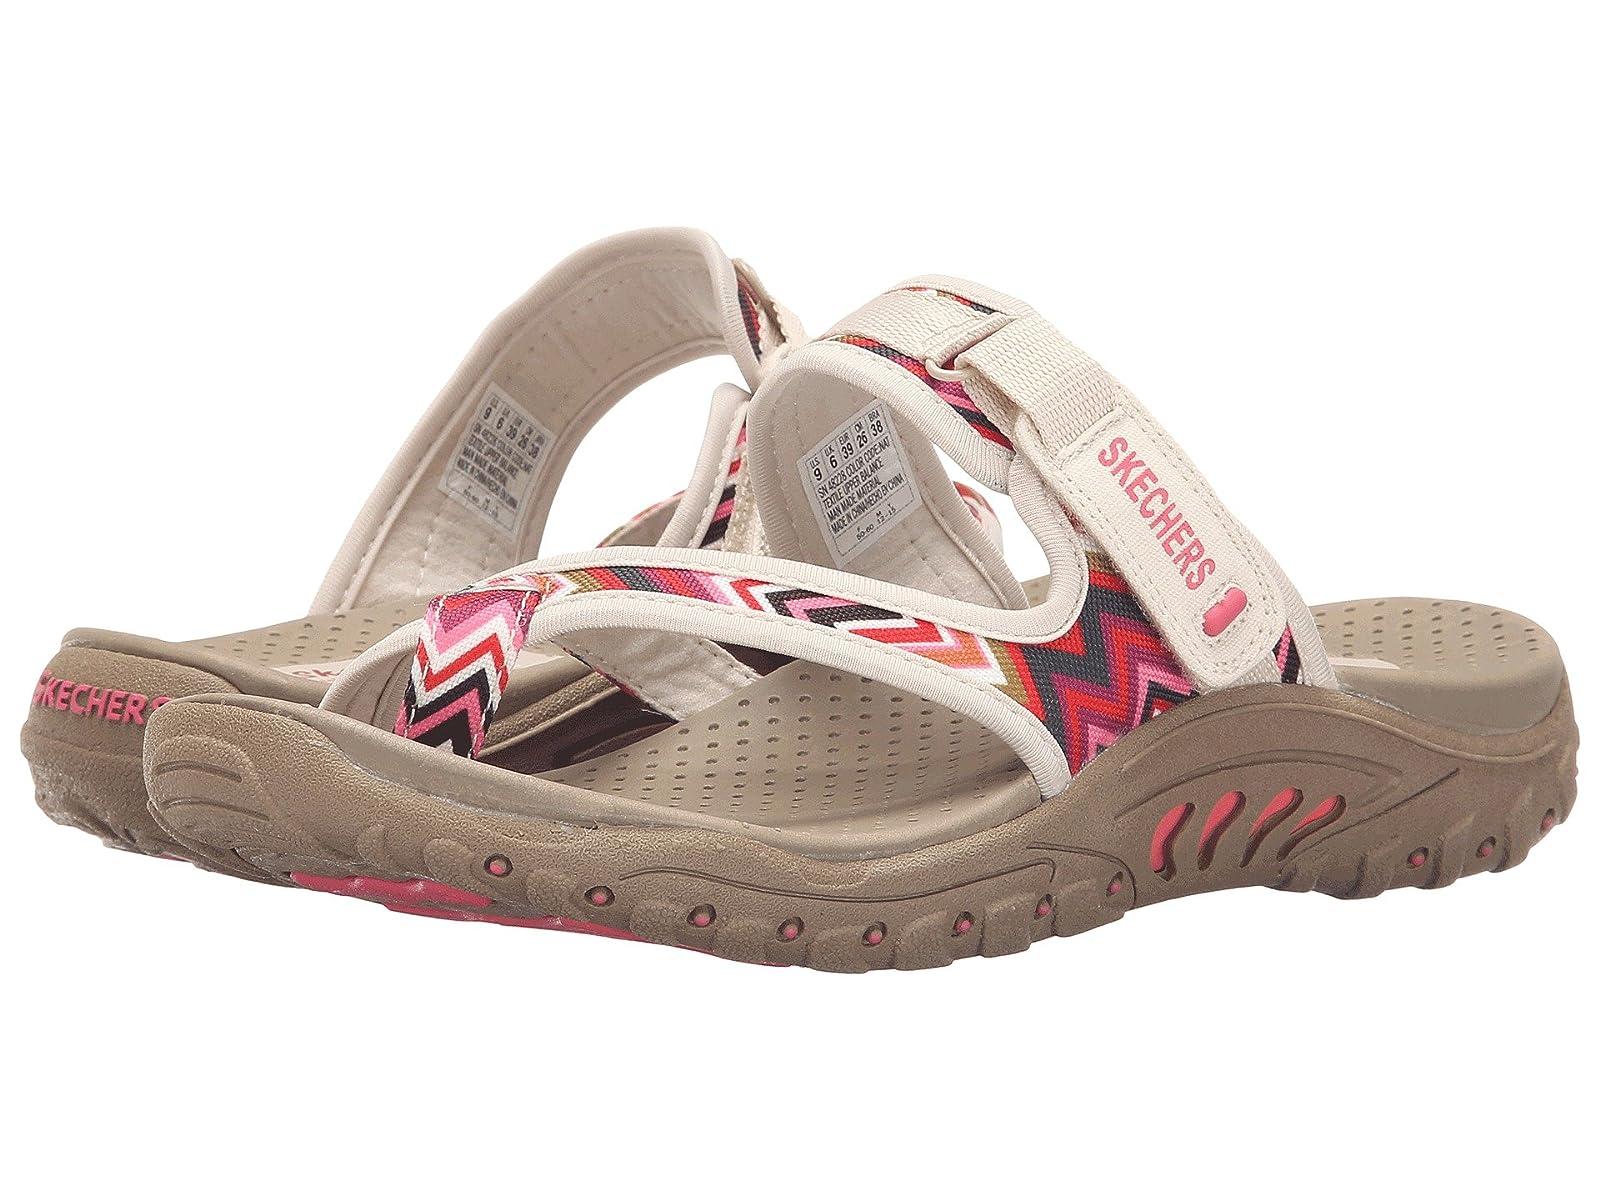 SKECHERS Reggae - Zig SwagAtmospheric grades have affordable shoes